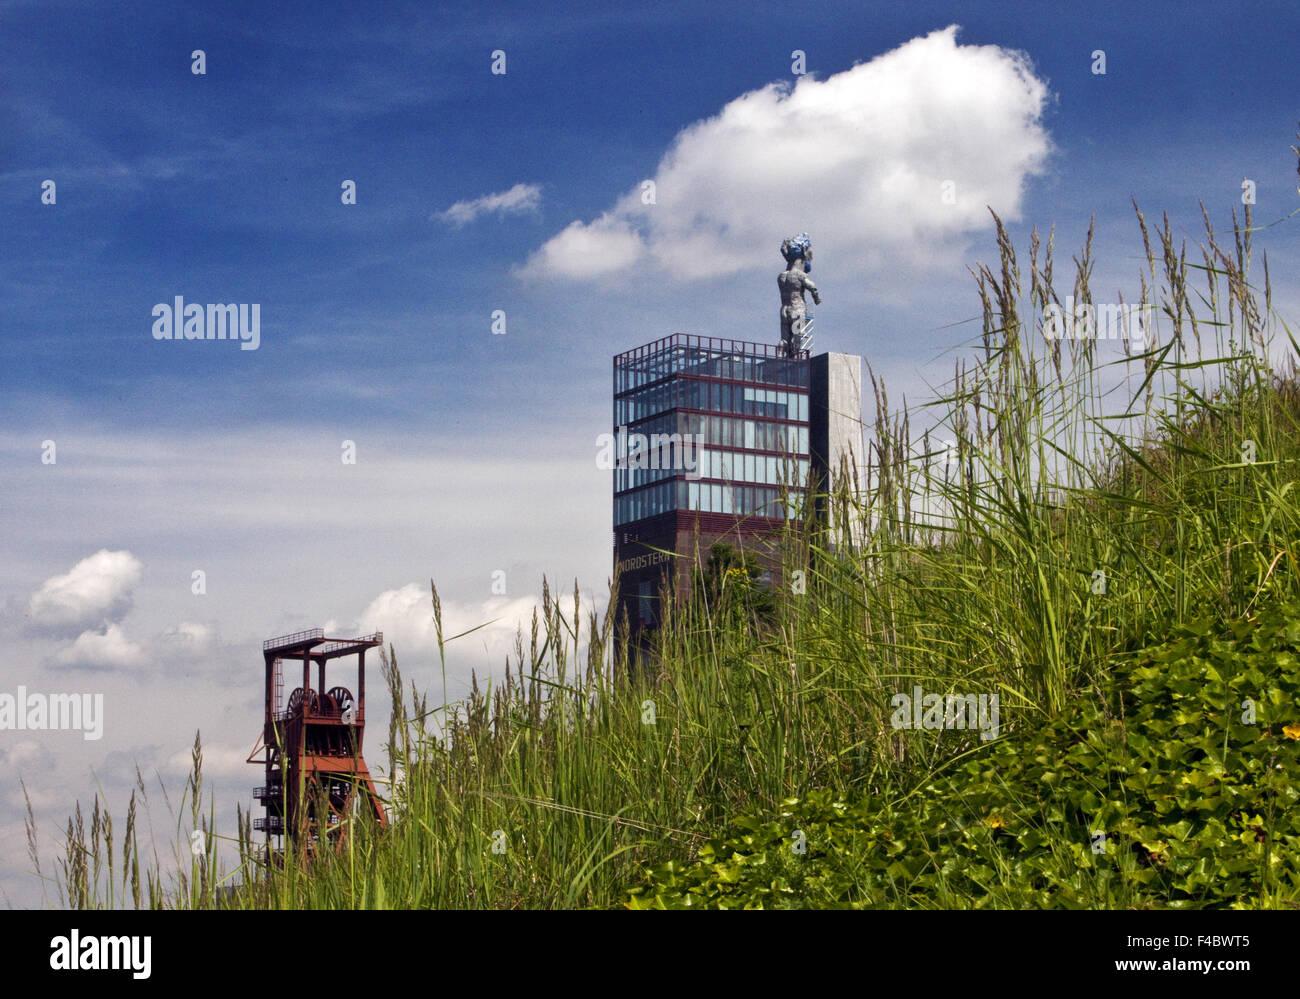 Nordstern Park, Gelsenkirchen, Germany - Stock Image